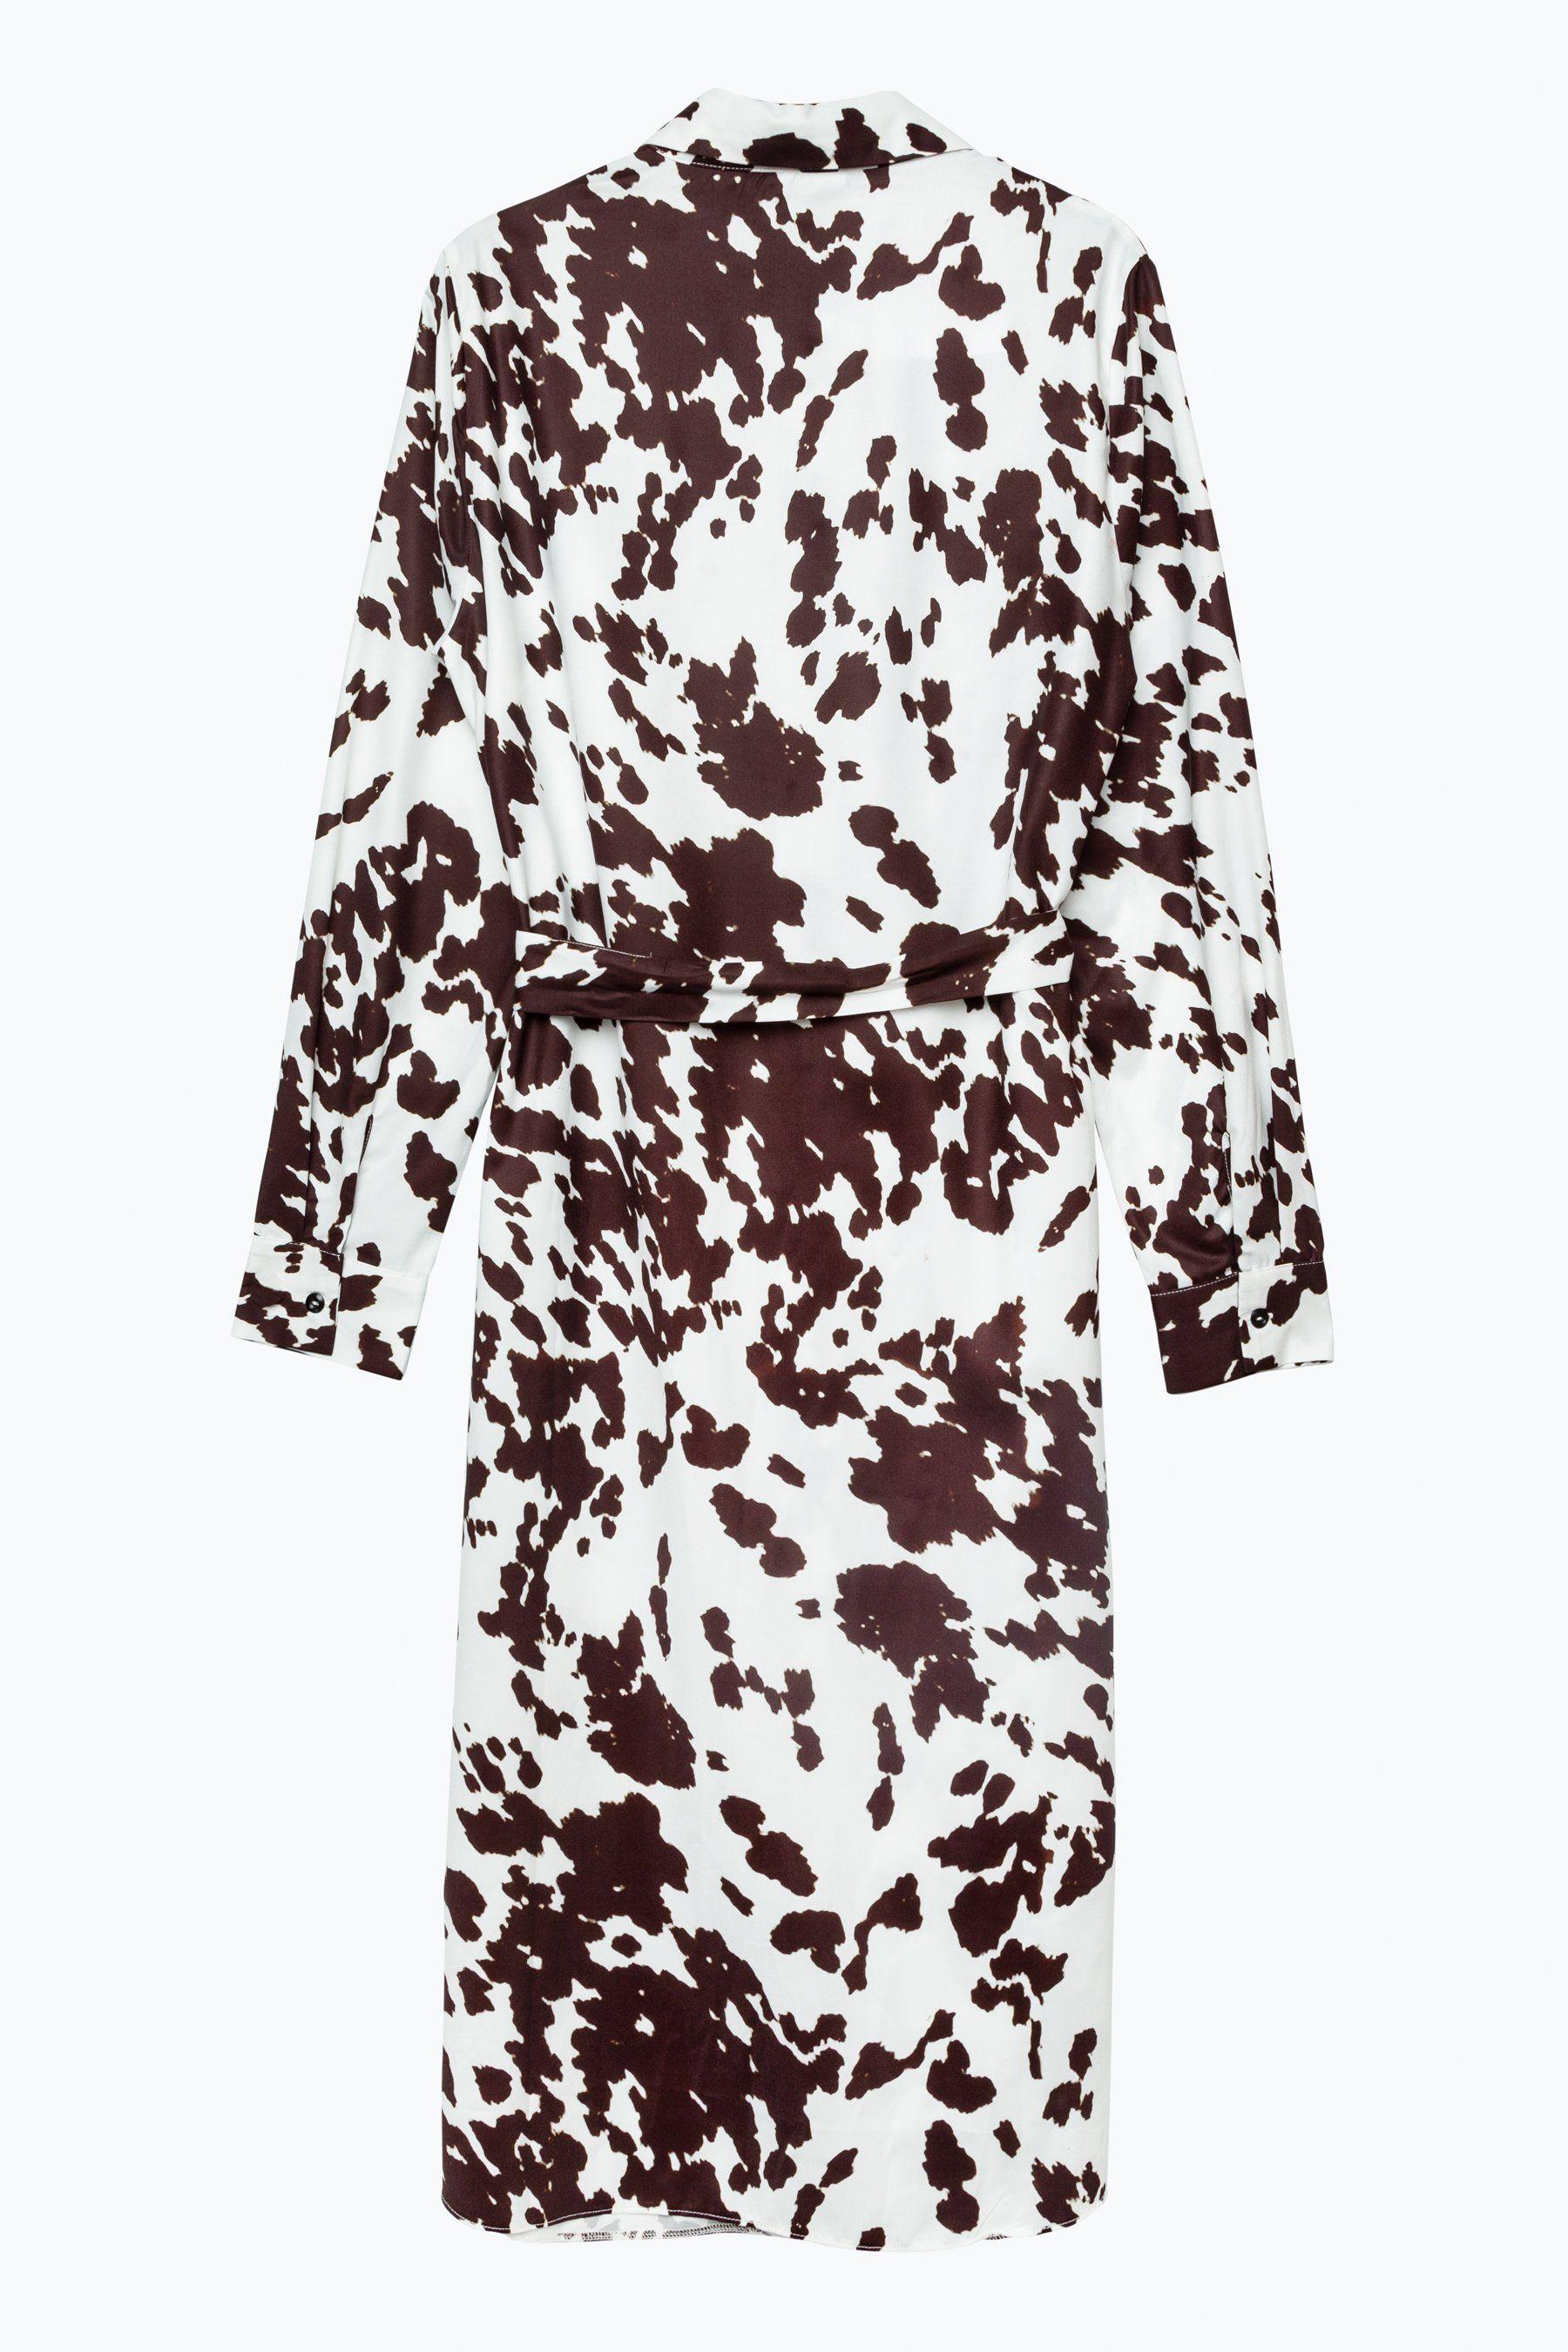 Hype Cow Print Womens Midi Dress